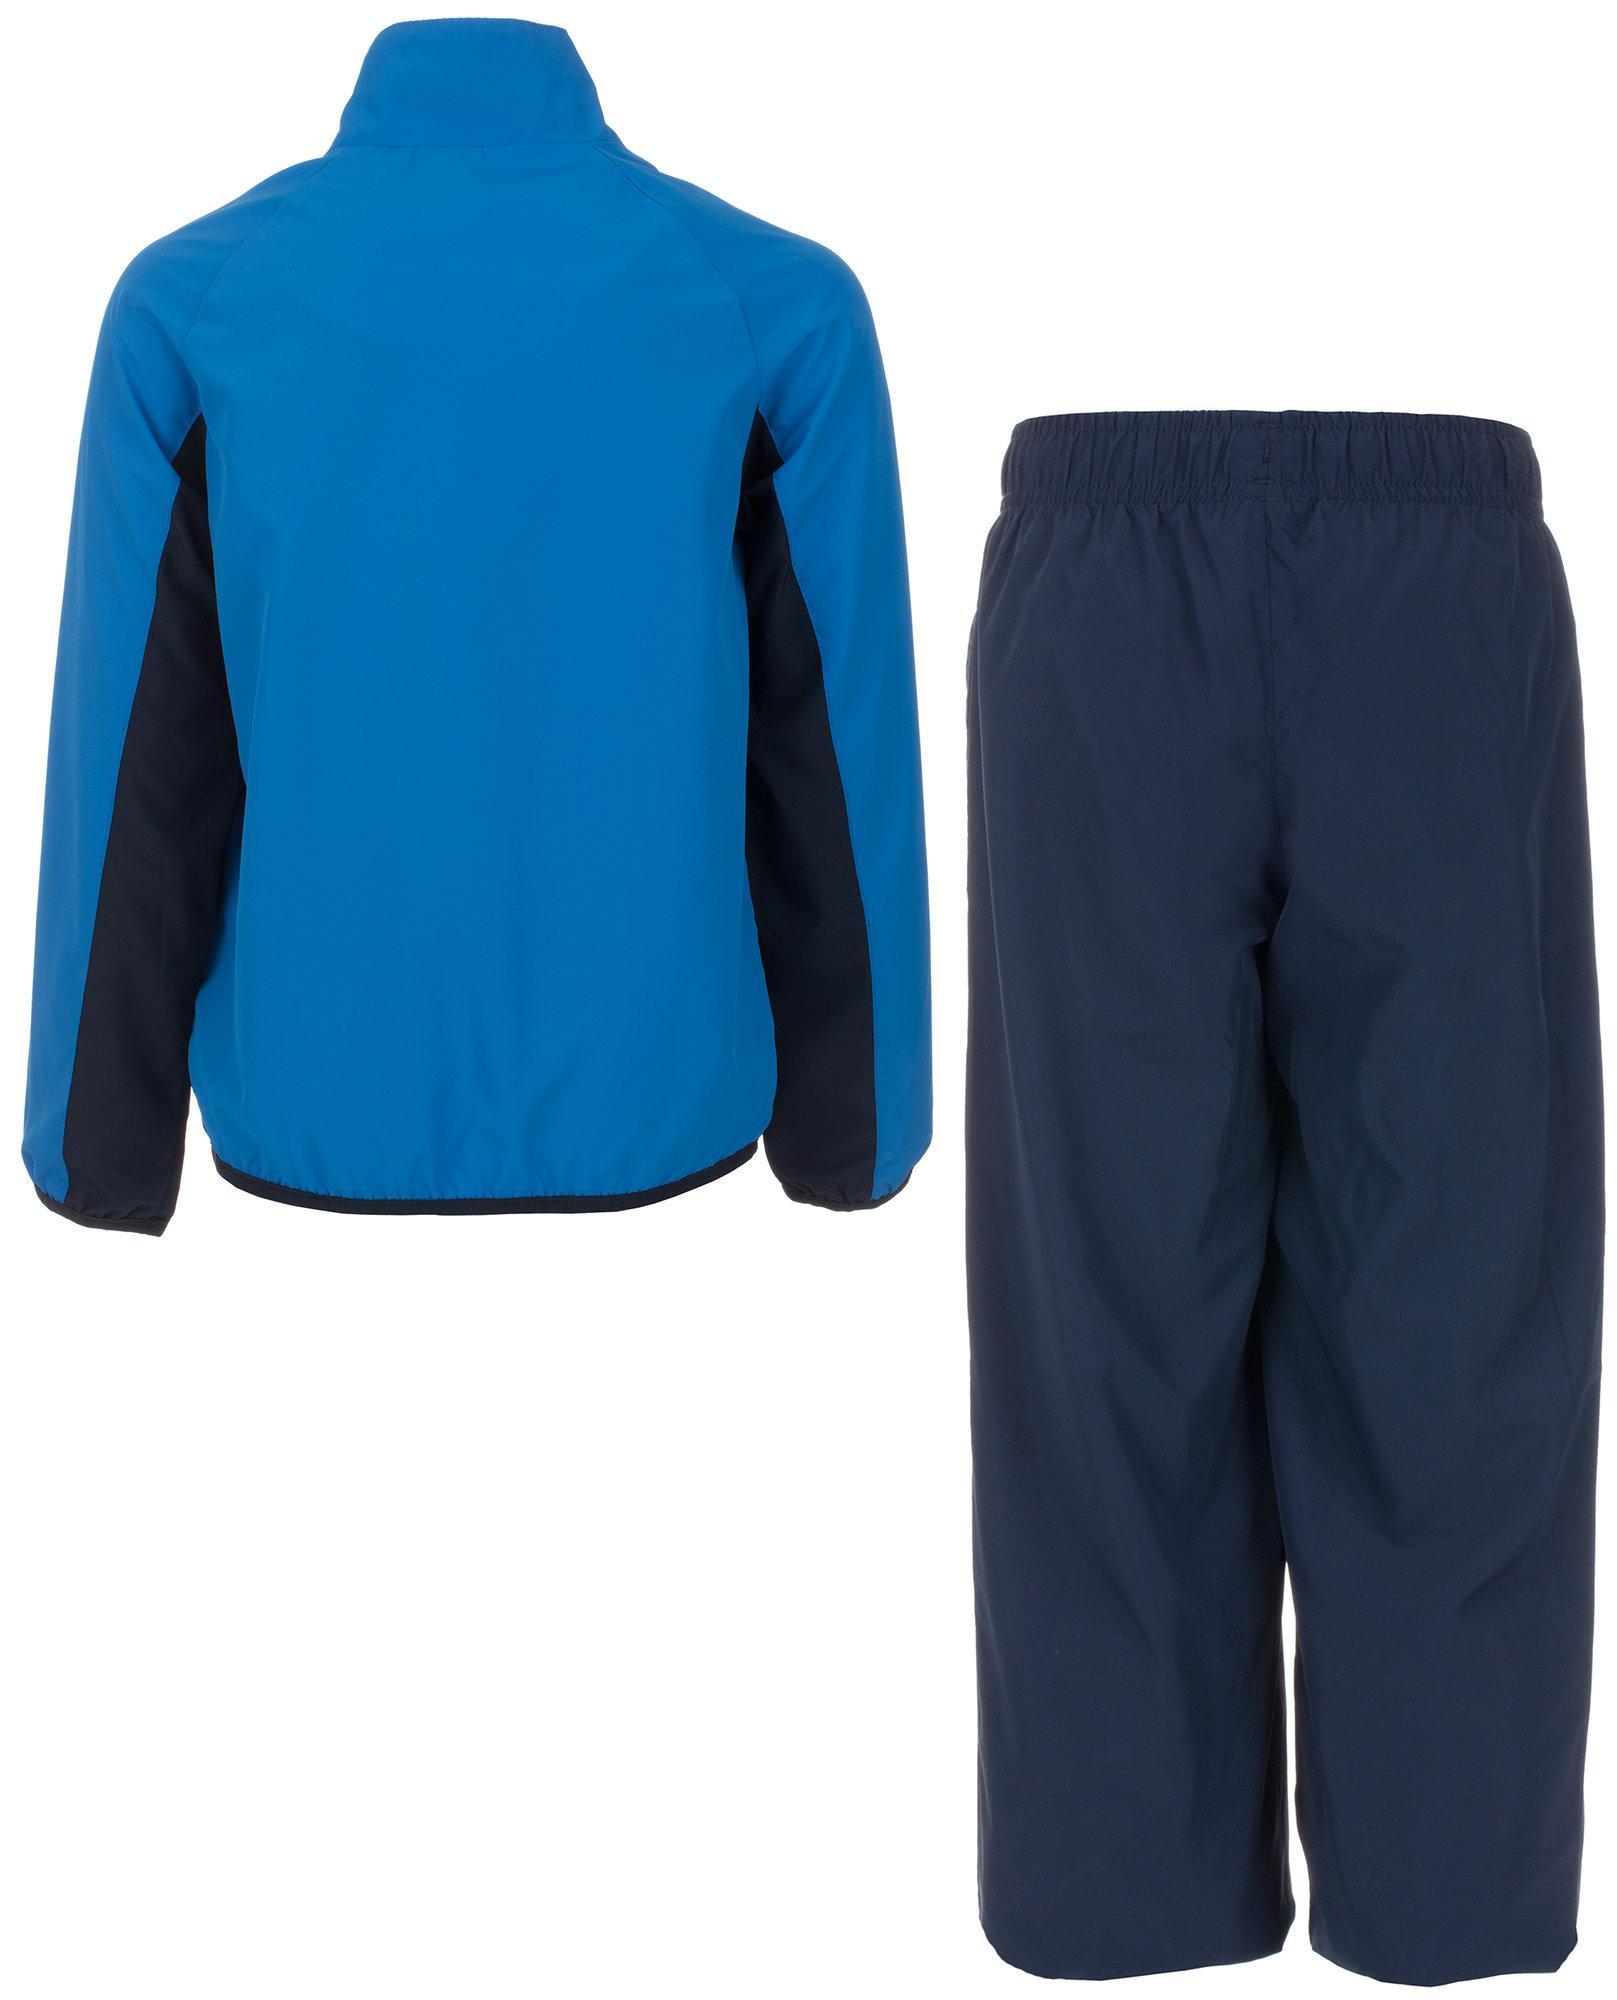 ... Demix Детский спортивный костюм Demix, размер 158 фото 2 ... 185f3914c50